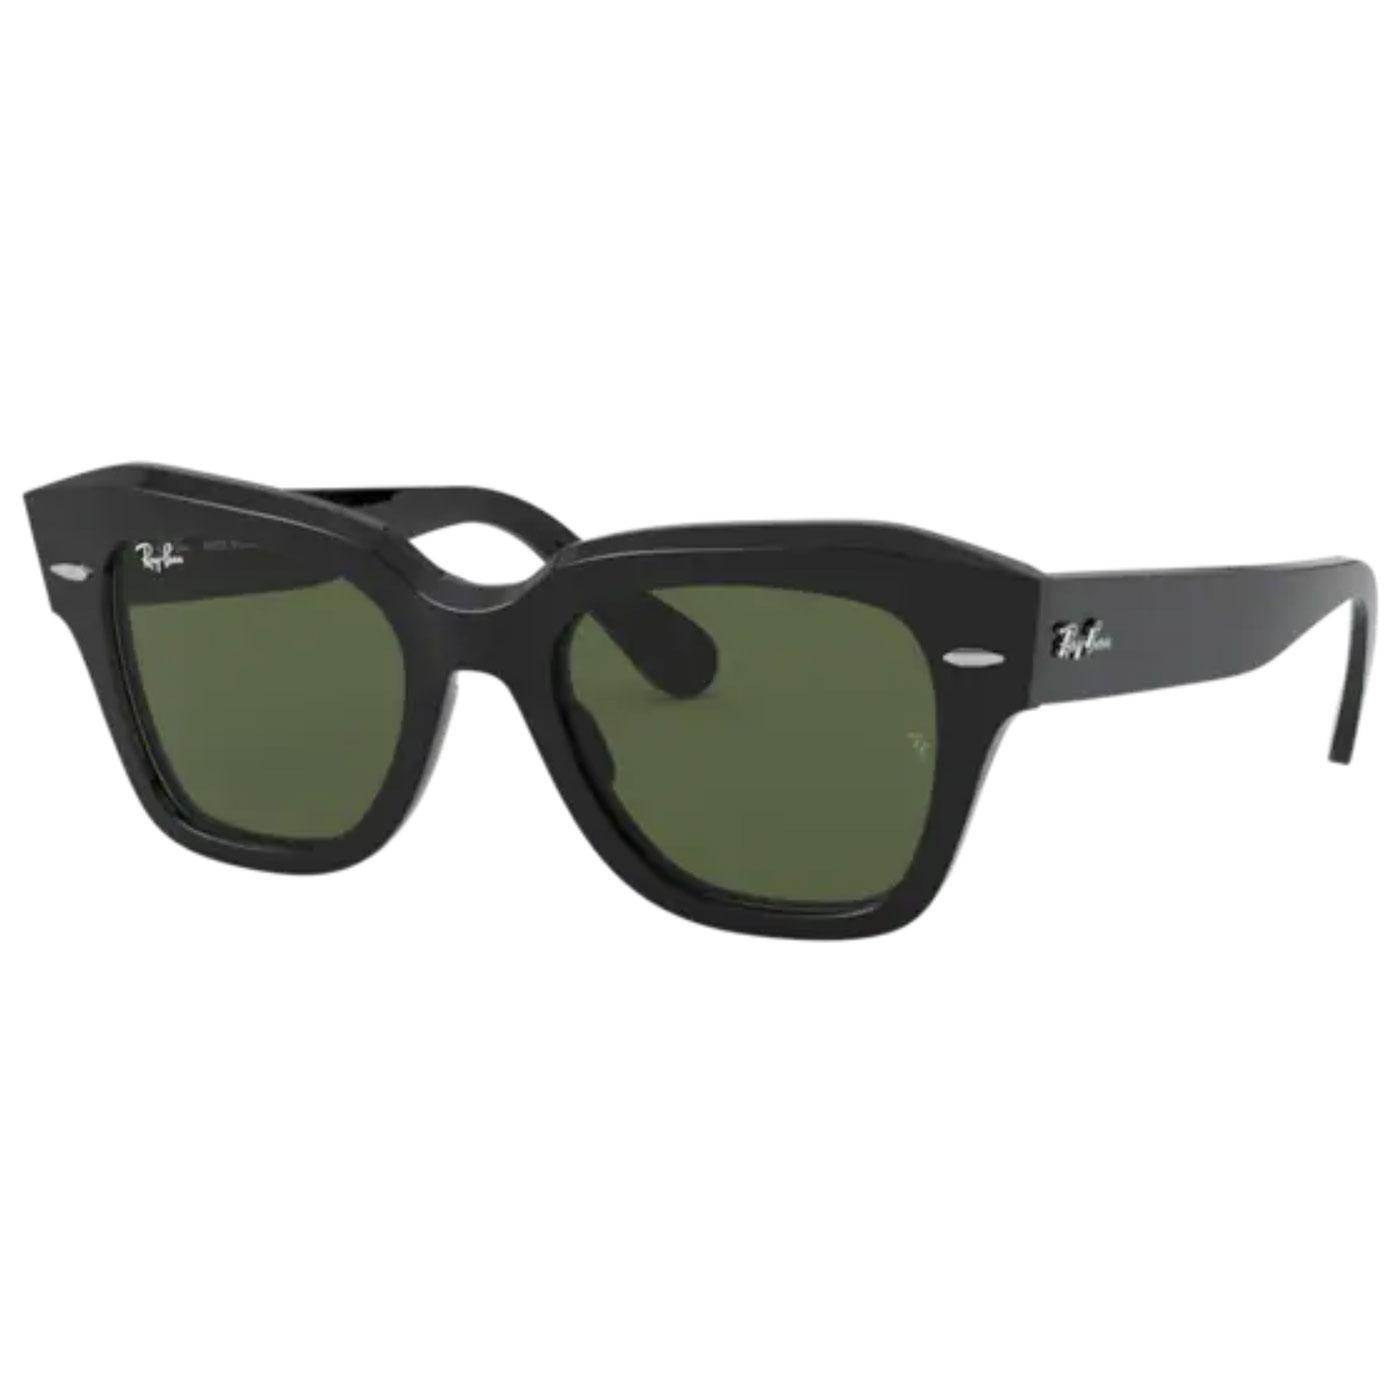 RAY-BAN RB2186 Cats Eye Wayfarer Sunglasses BLACK